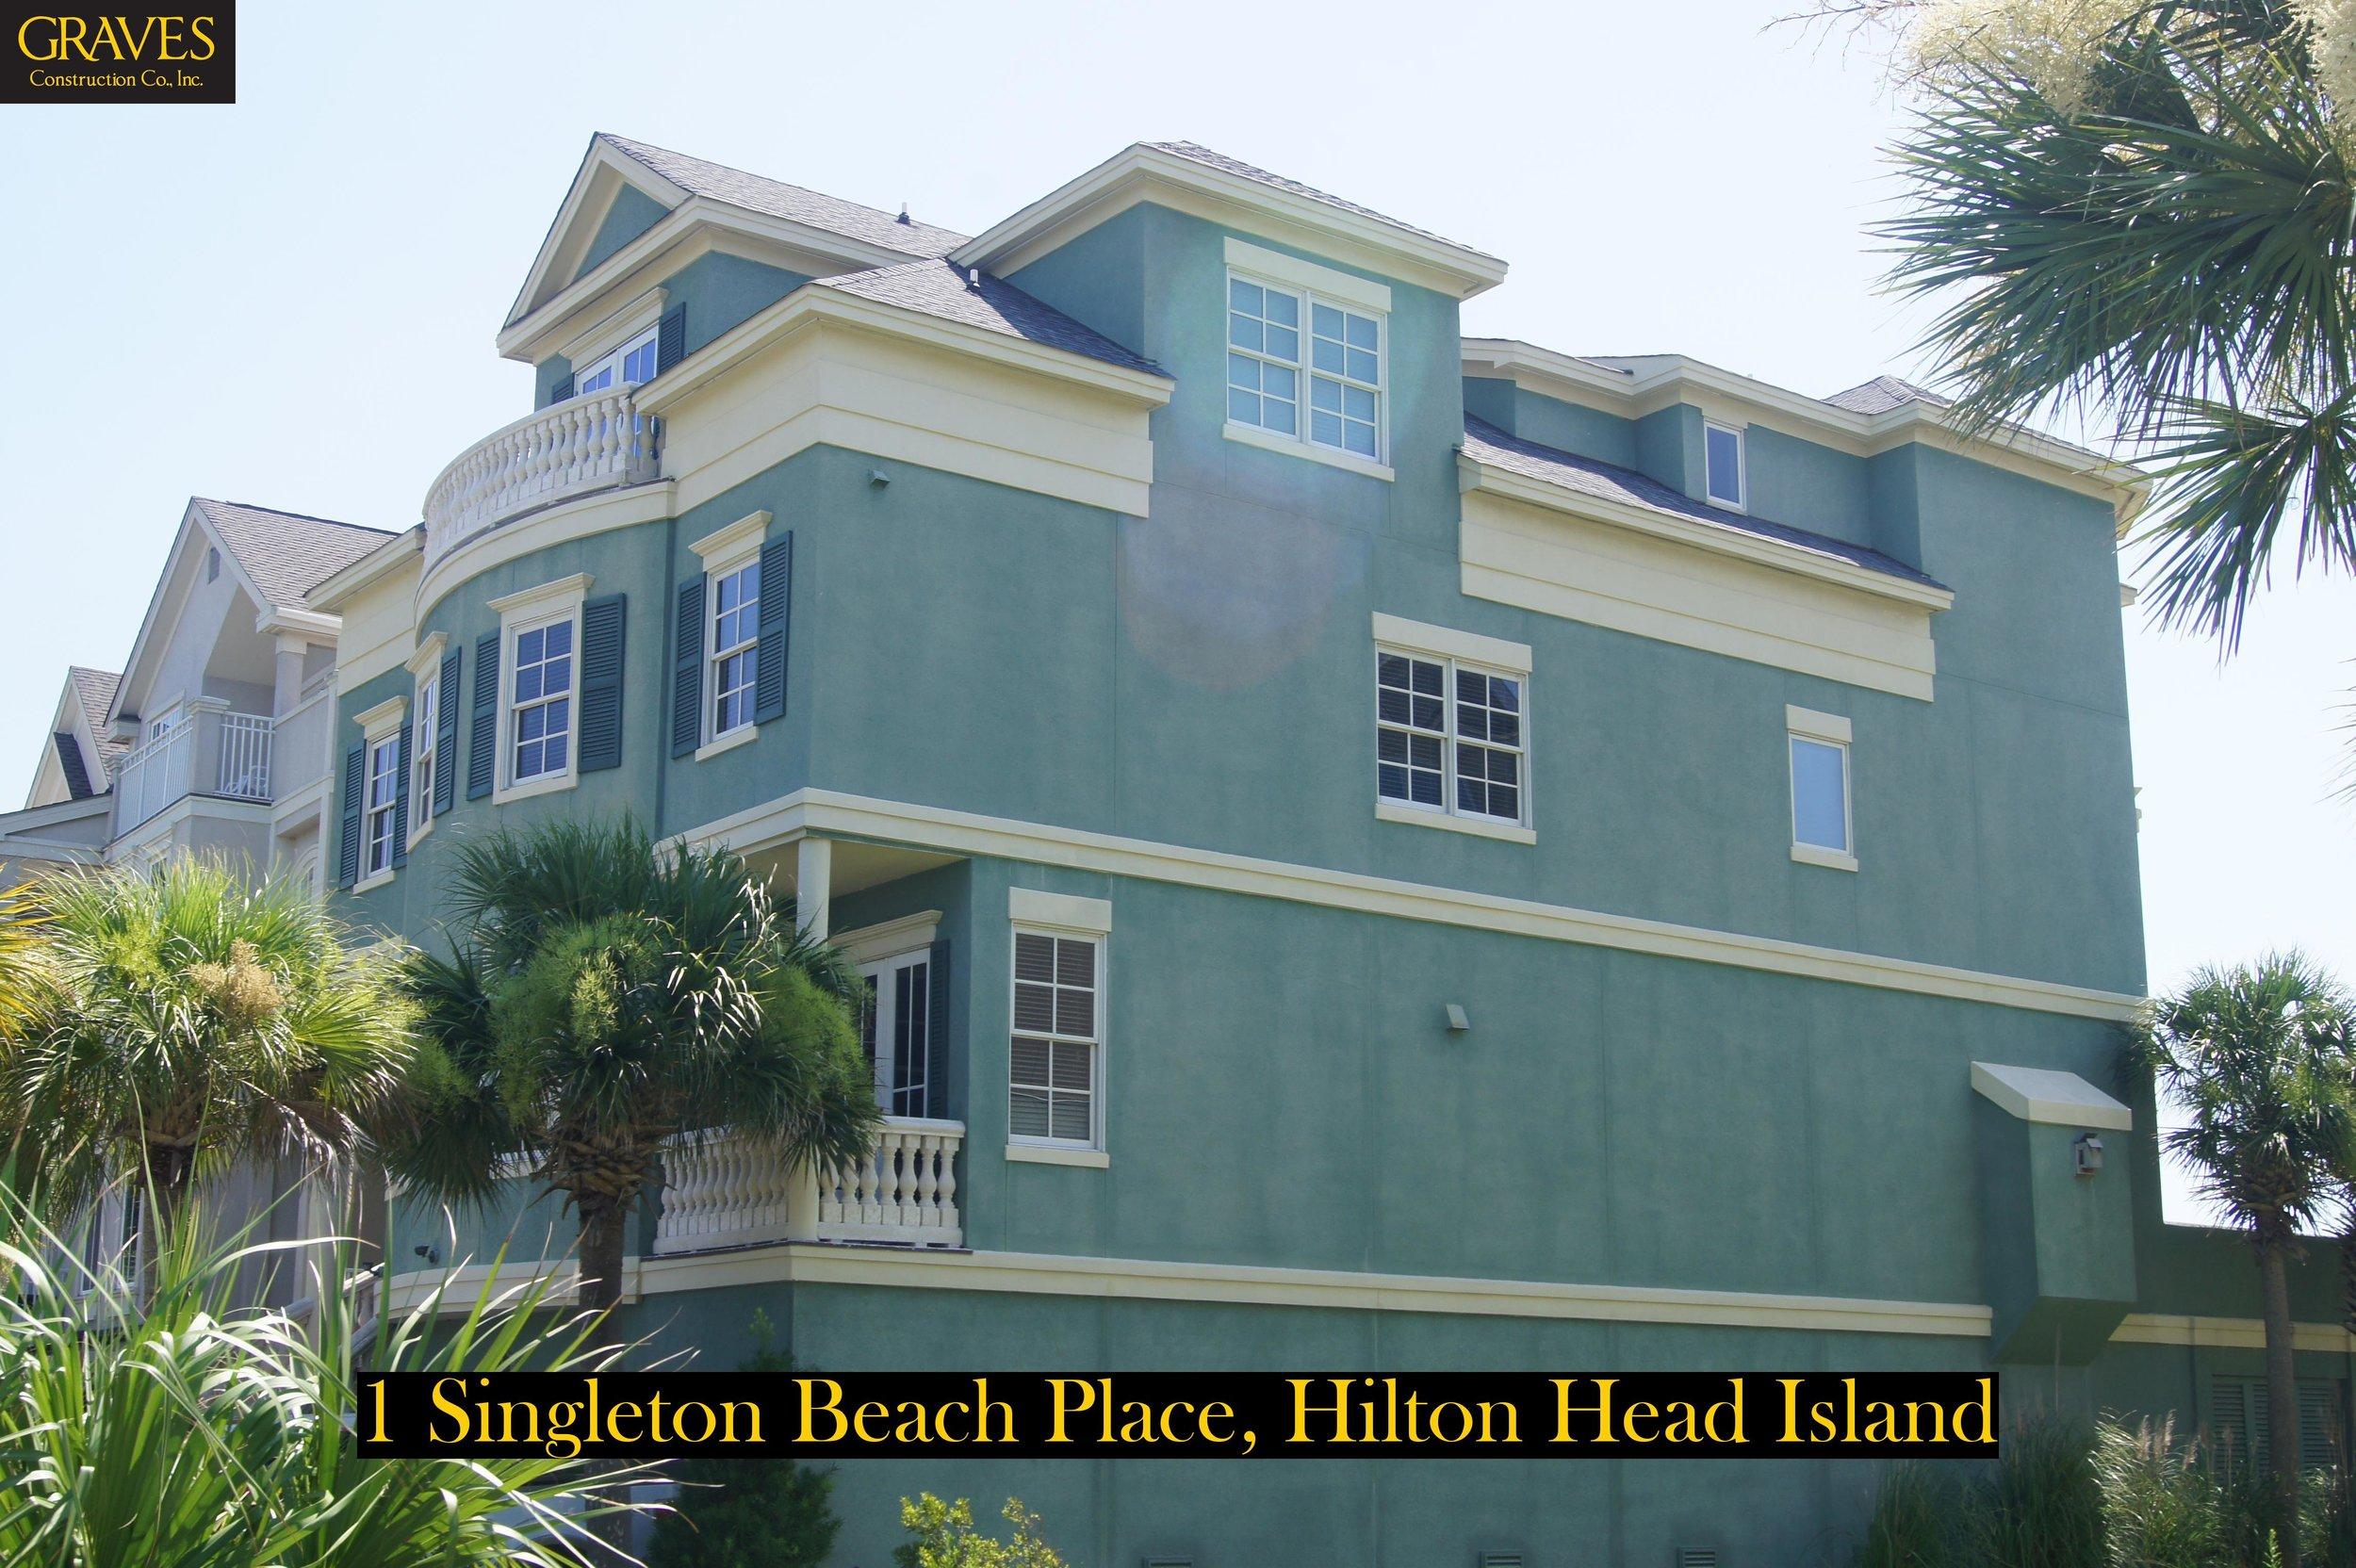 1 Singleton Beach Pl - 3